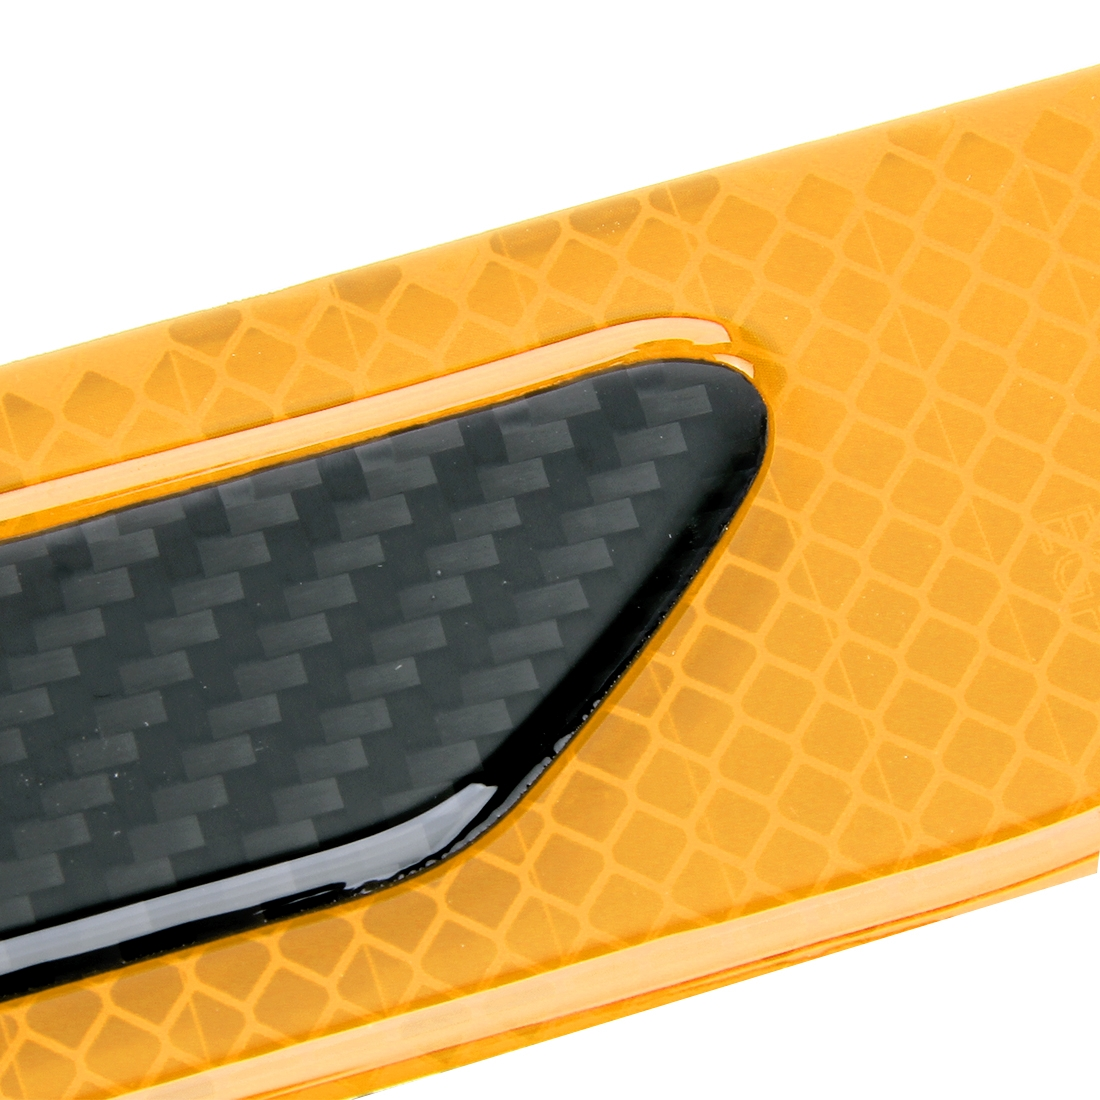 2 PCS Carbon Fiber Car-Styling Fender Reflective Bumper Decorative Strip, External Reflection + Inner Carbon Fiber (Yellow)